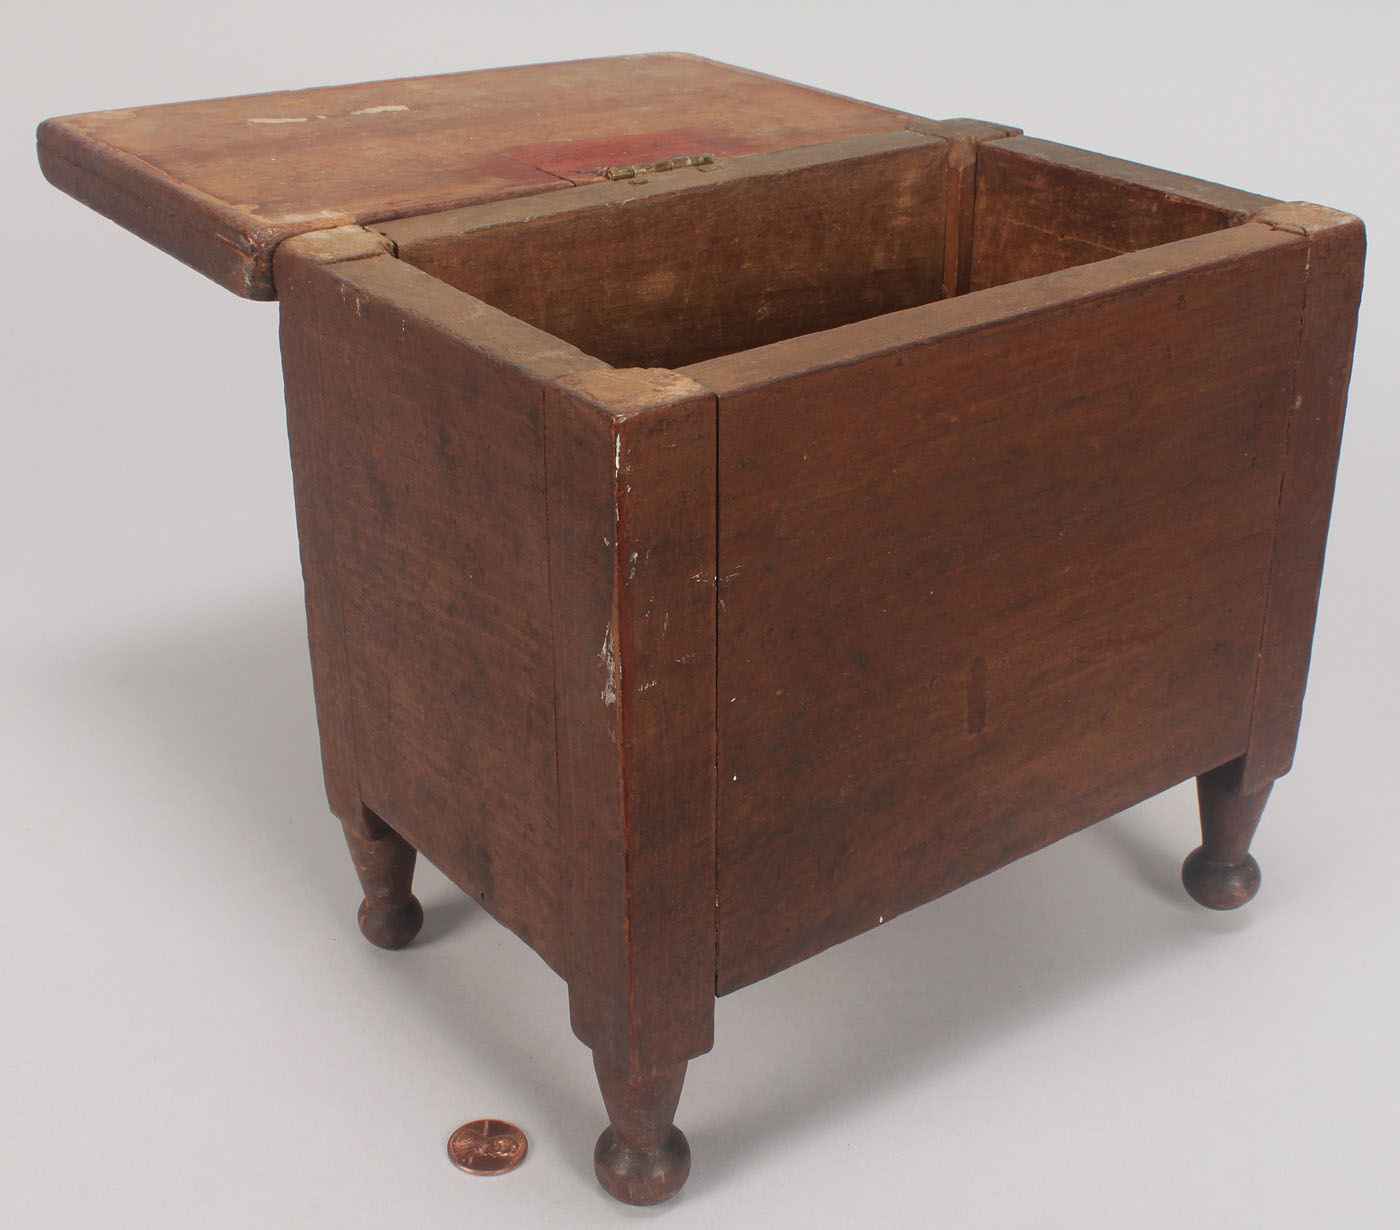 Lot 78 Miniature Southern Box Sugar Chest Form Orig Su